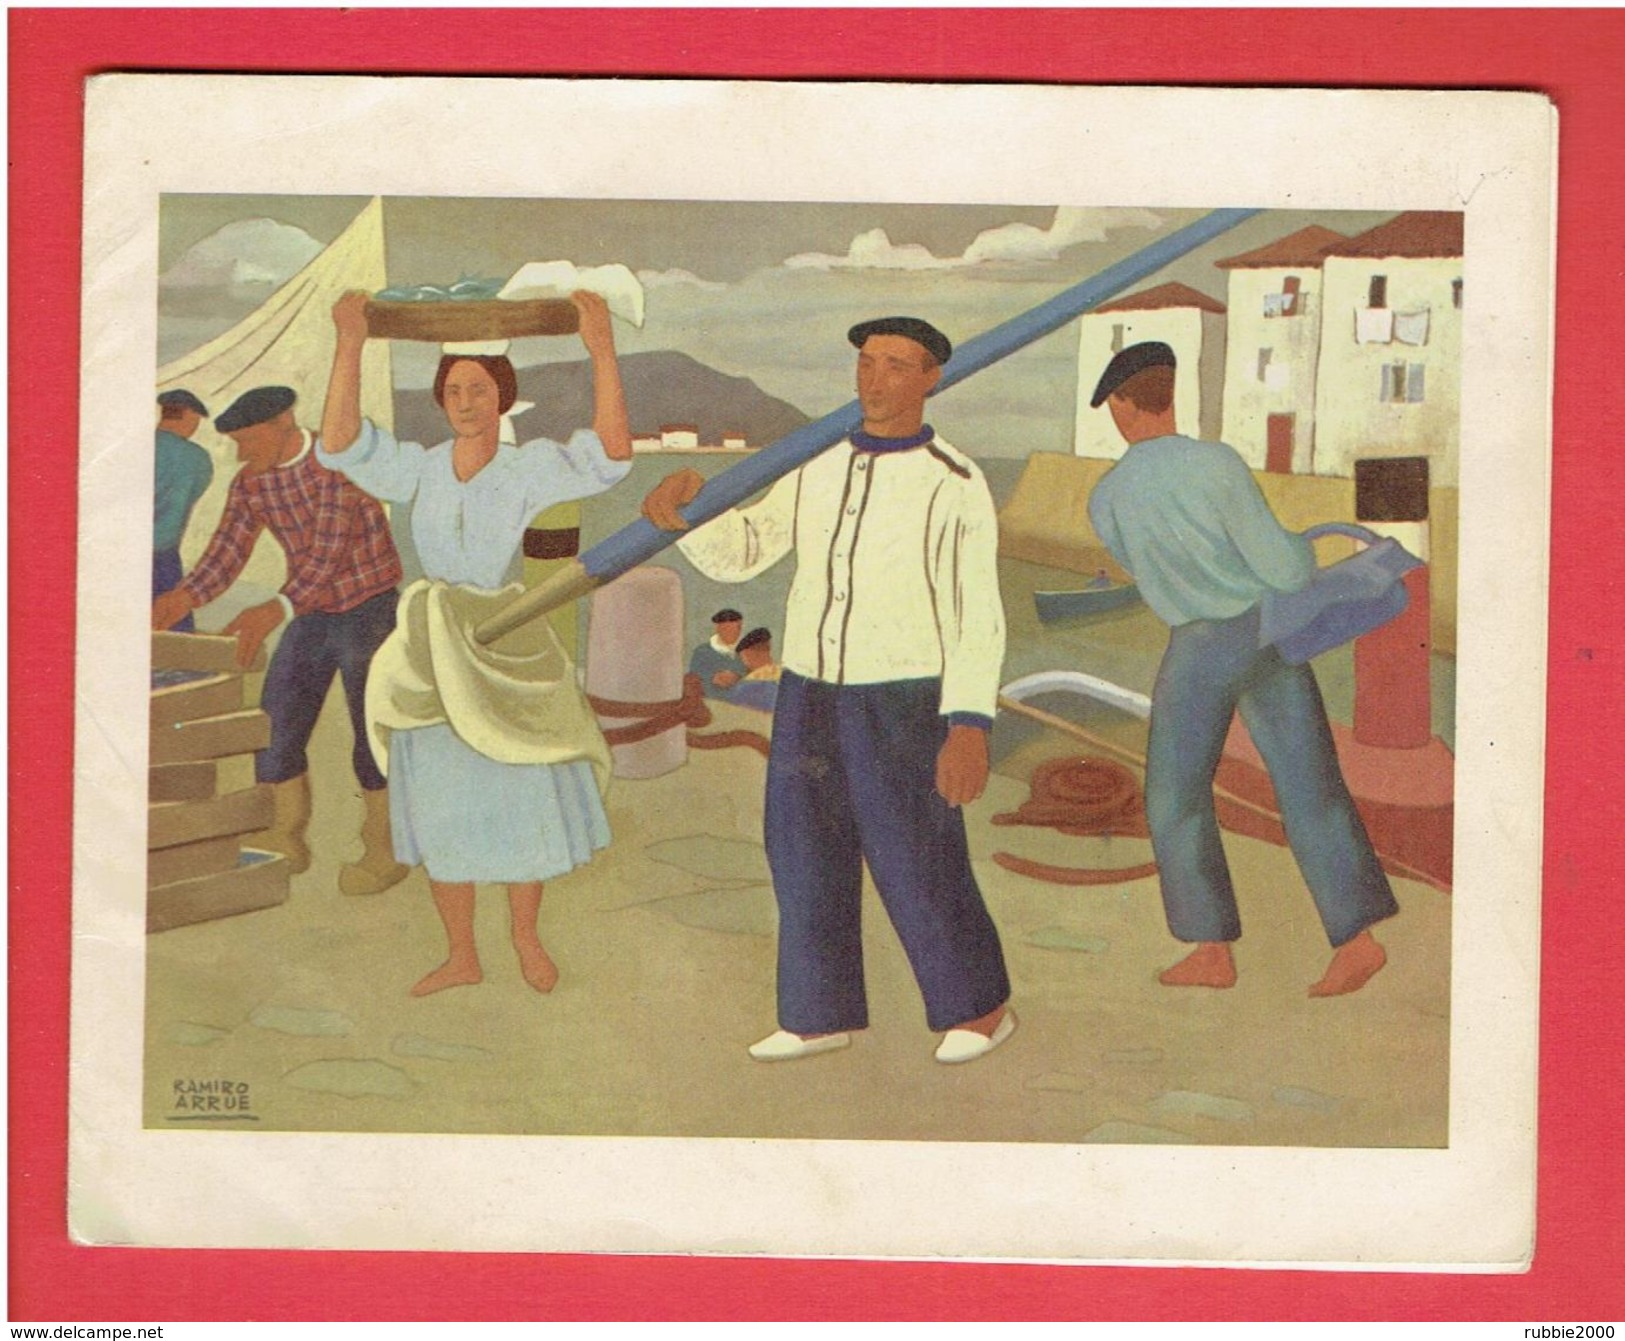 PAYS BASQUE 1964 TABLEAU DE RAMIRO ARRUE CARTE DOUBLE EN BON ETAT EDITEUR VALVERDE SAN SEBASTIAN - Unclassified